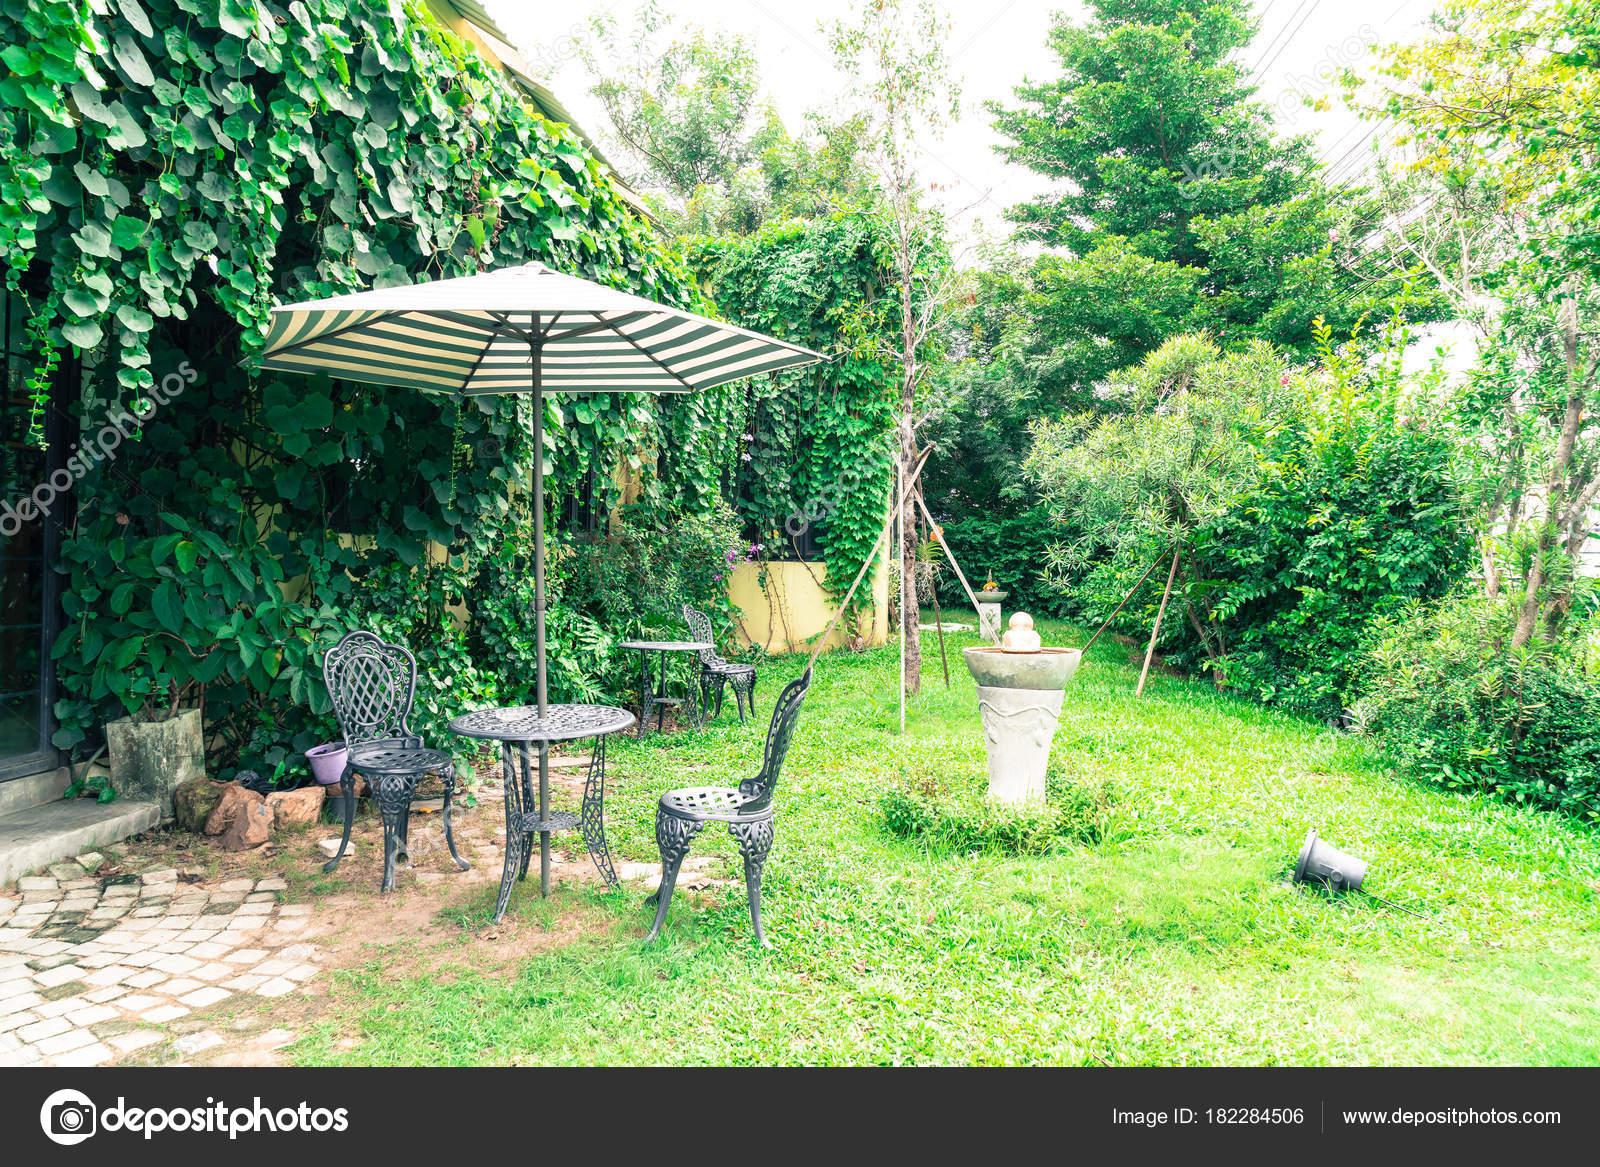 Vintage Outdoor Patiostuhl Im Garten Stockfoto Topntp 182284506